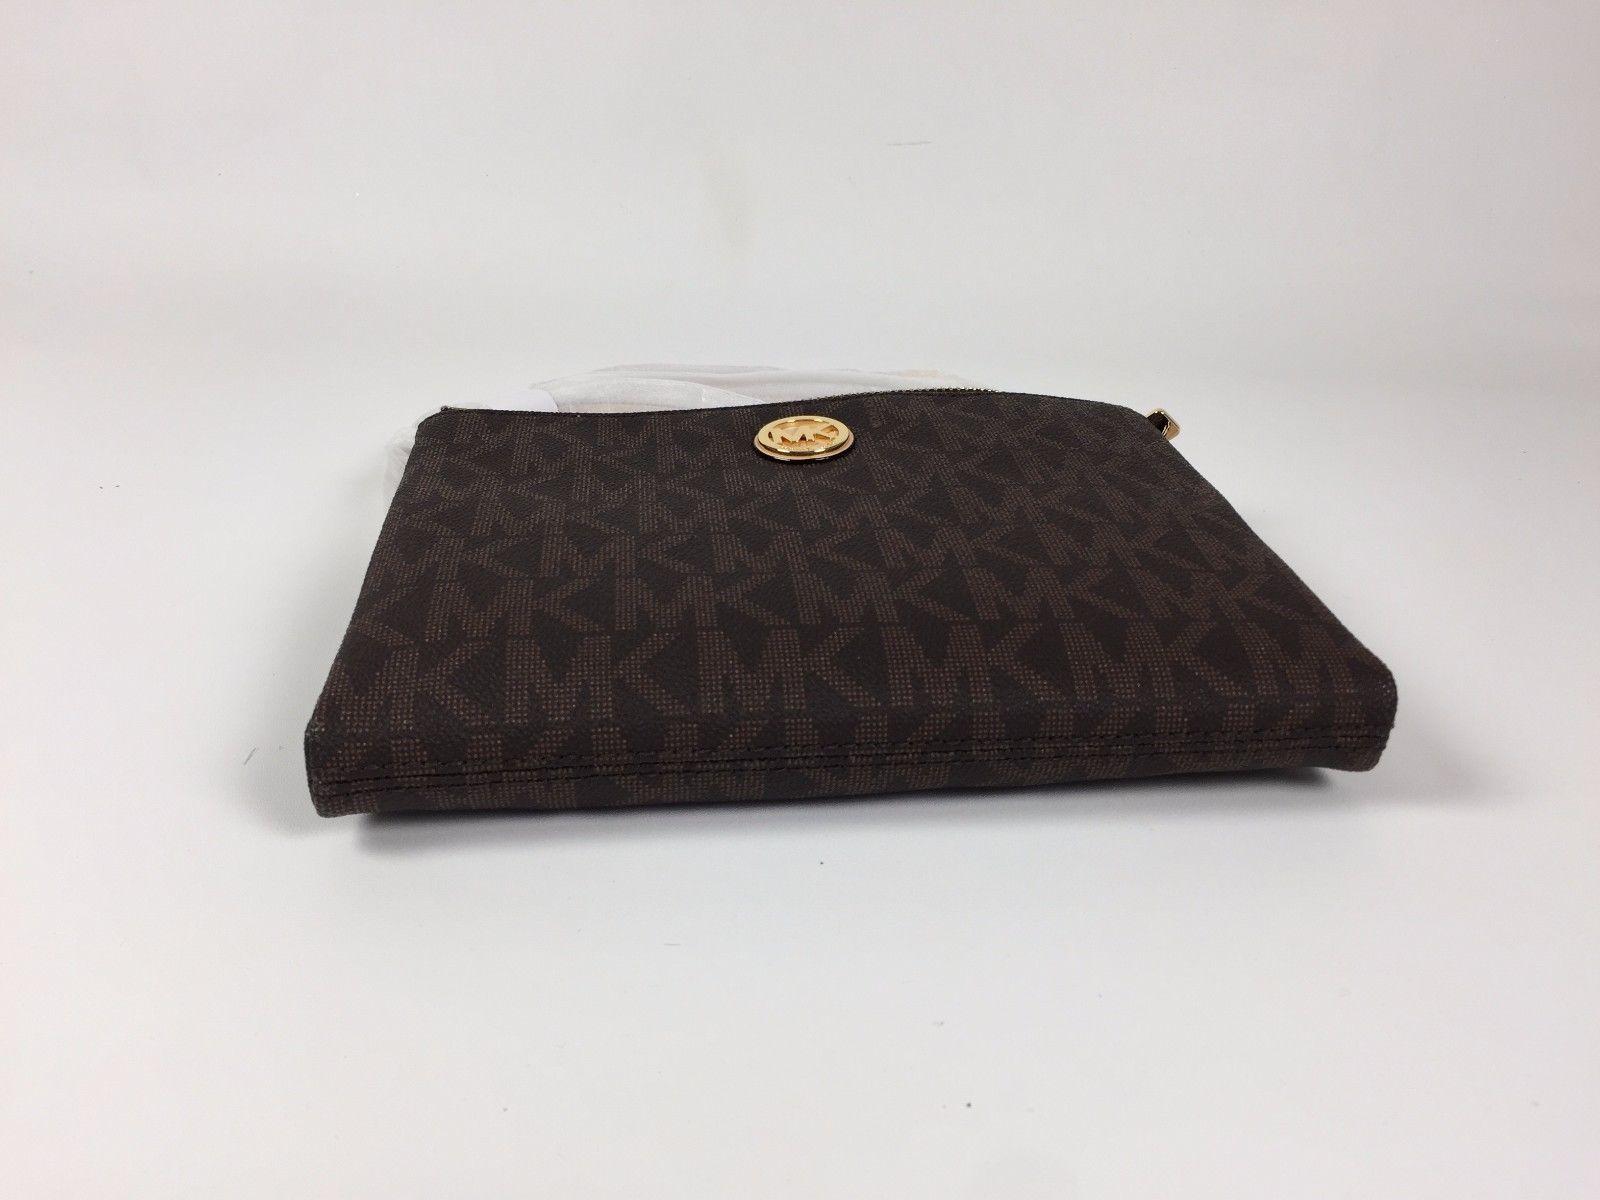 fb6dc2dbd967 NWT Michael Kors Brown Crossbody PVC Handbag MK Signature Messenger Bag   118.0